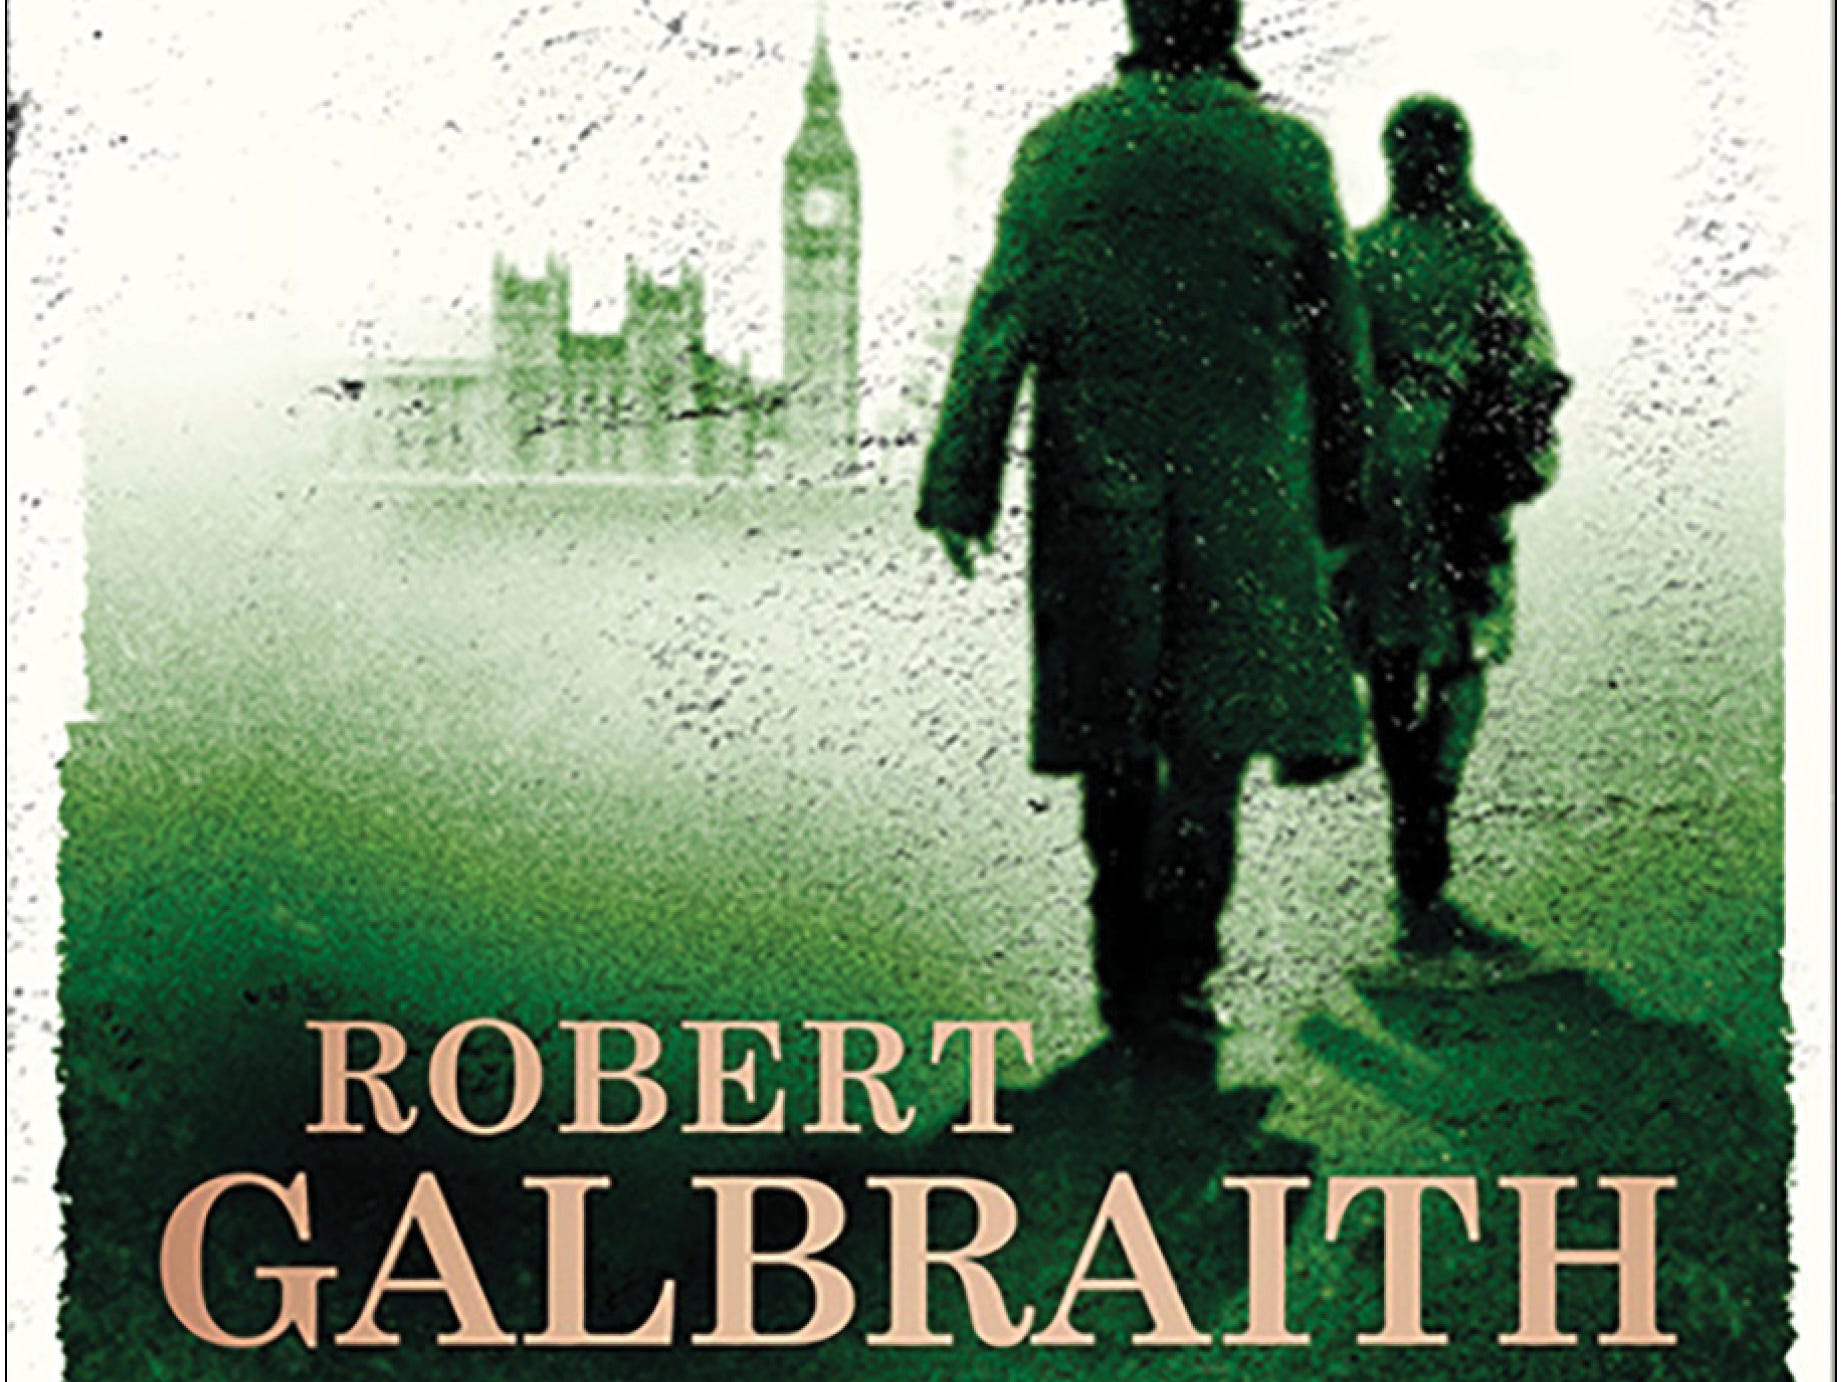 Weekend picks for book lovers, including the new Robert Galbraith (aka J.K. Rowling)